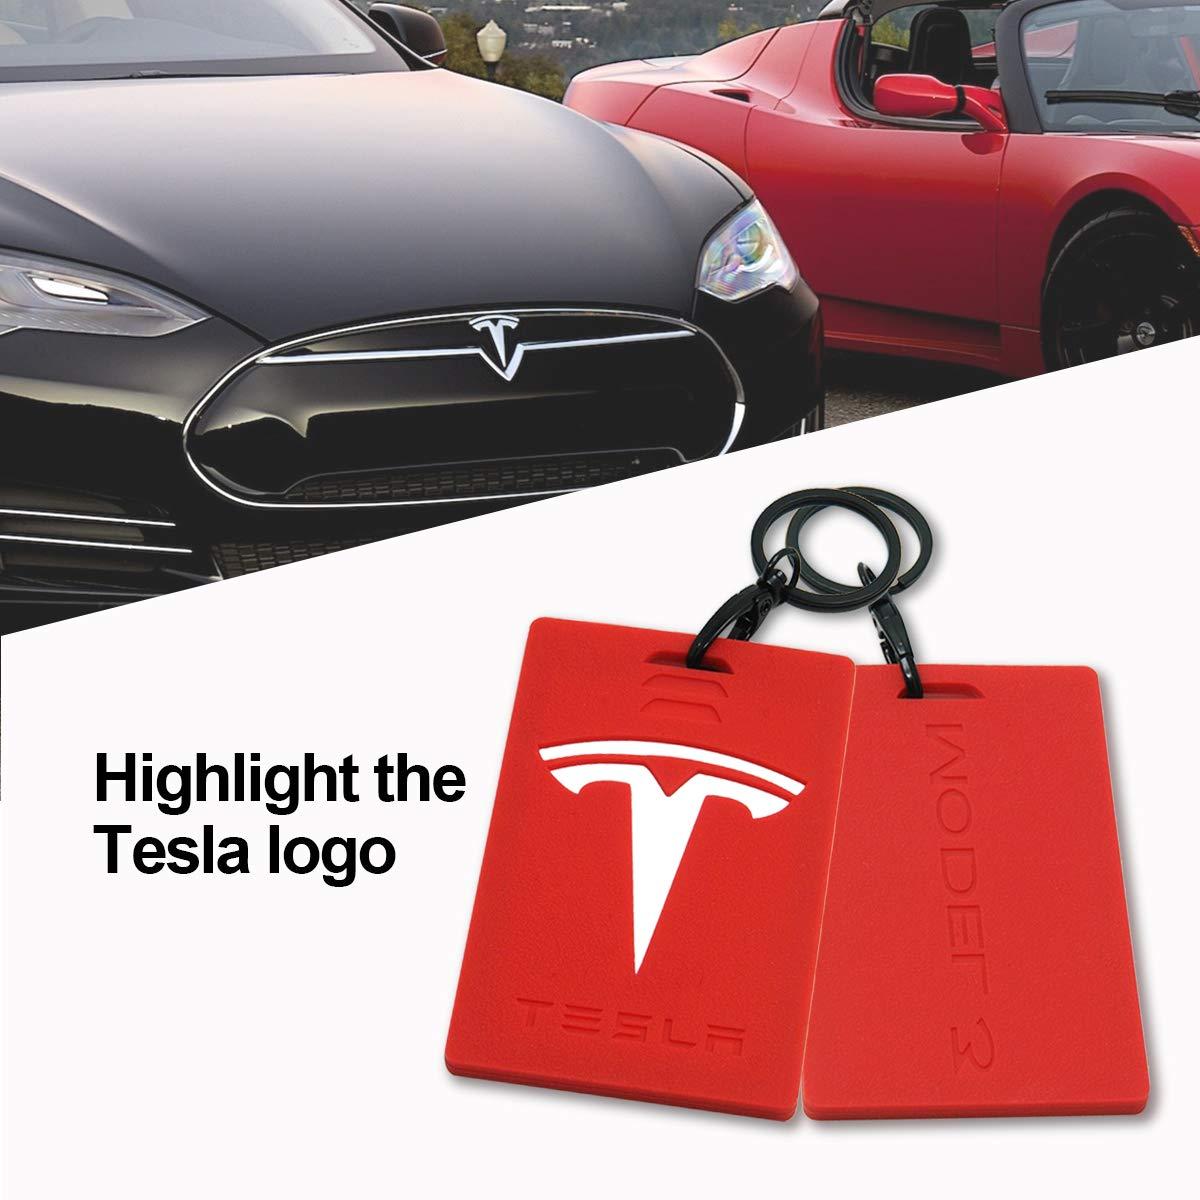 Wall Stickz Car Sales Key Card Holder for Tesla Model 3 Silicone Protector Cover Key Card Keychain Black